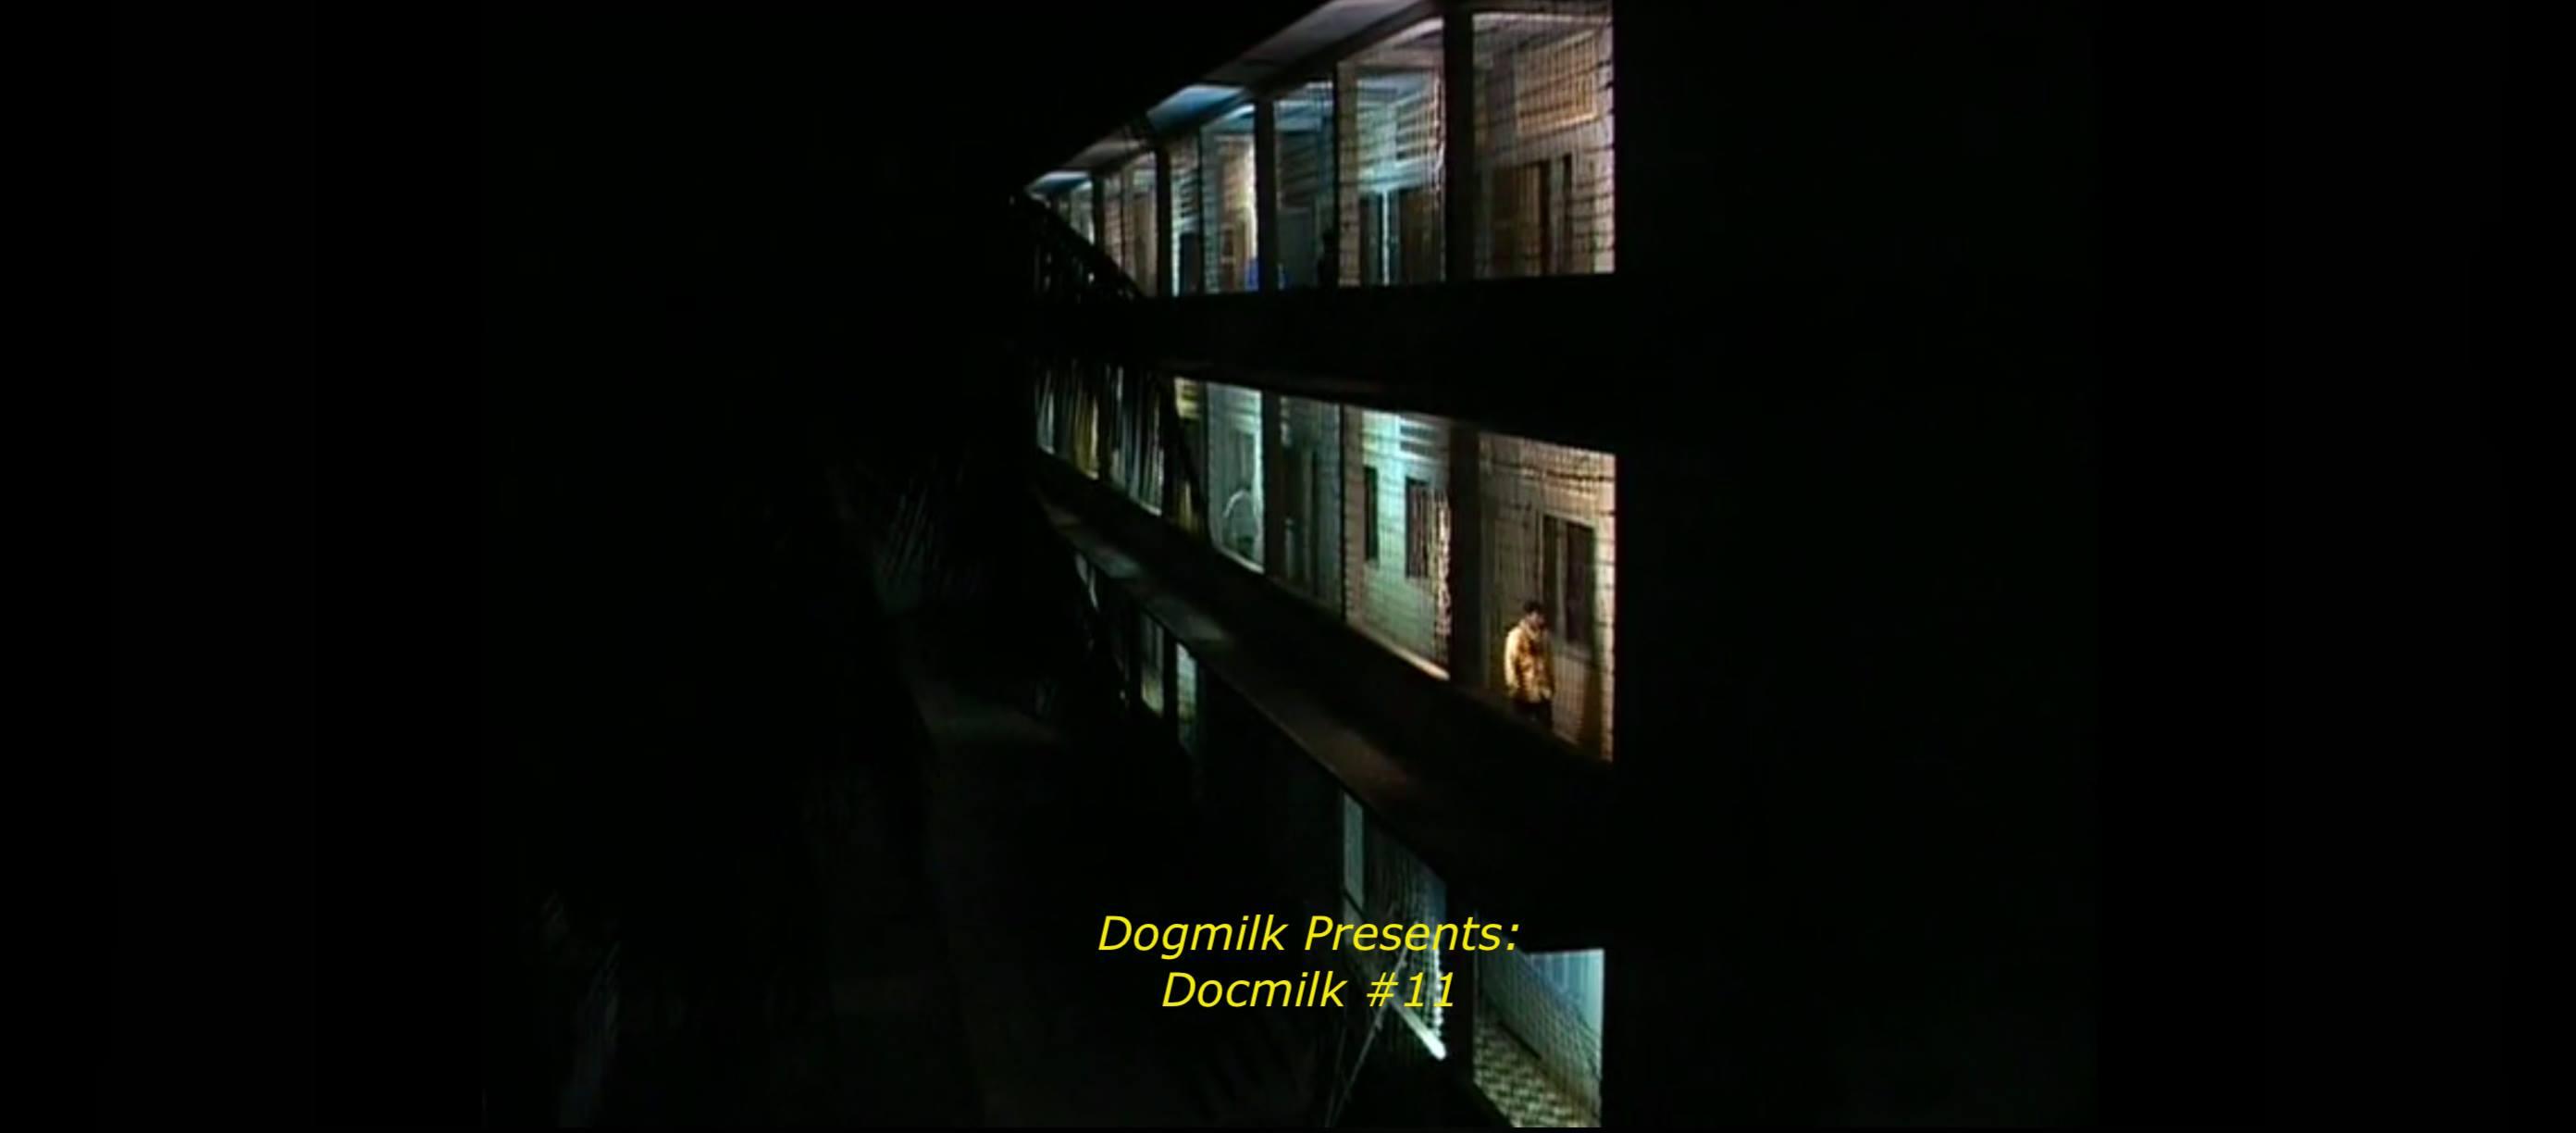 Dogmilk Presents Docmilk #11: S-21 The Khmer Rouge Killing Machine